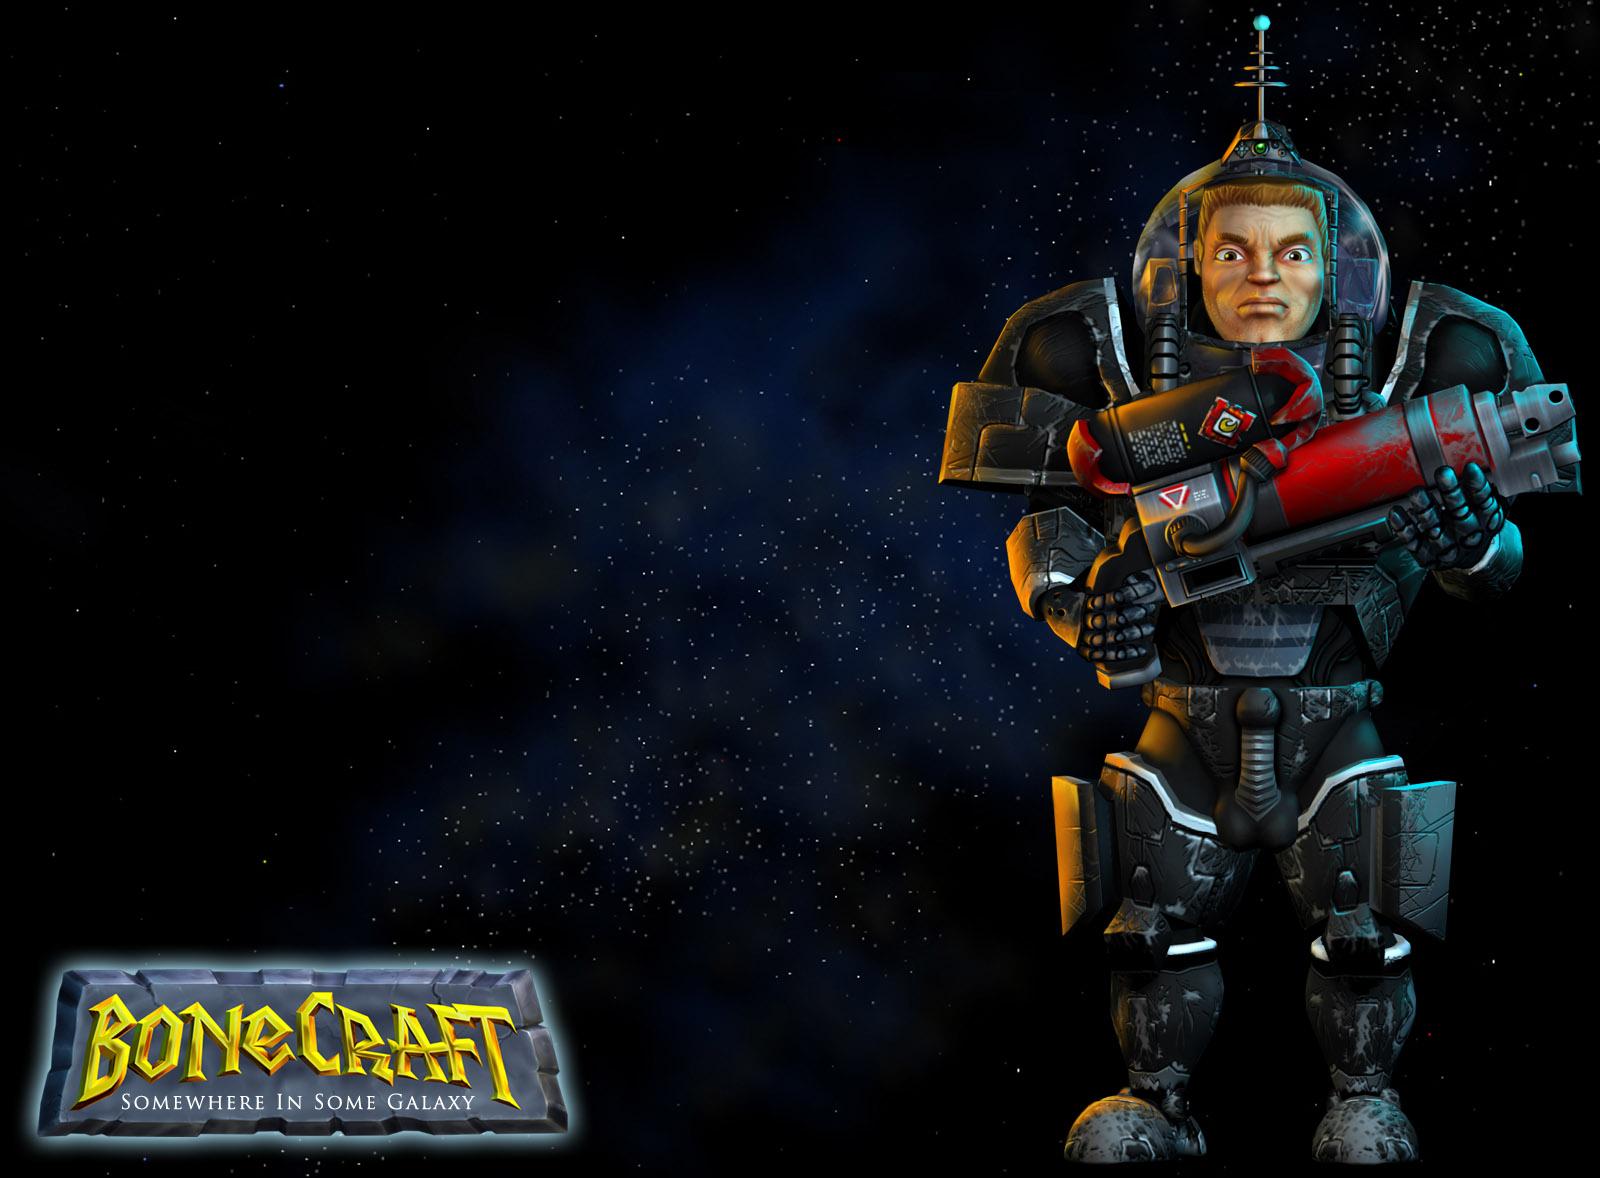 BoneCraft Space Wrangler Wallpaper